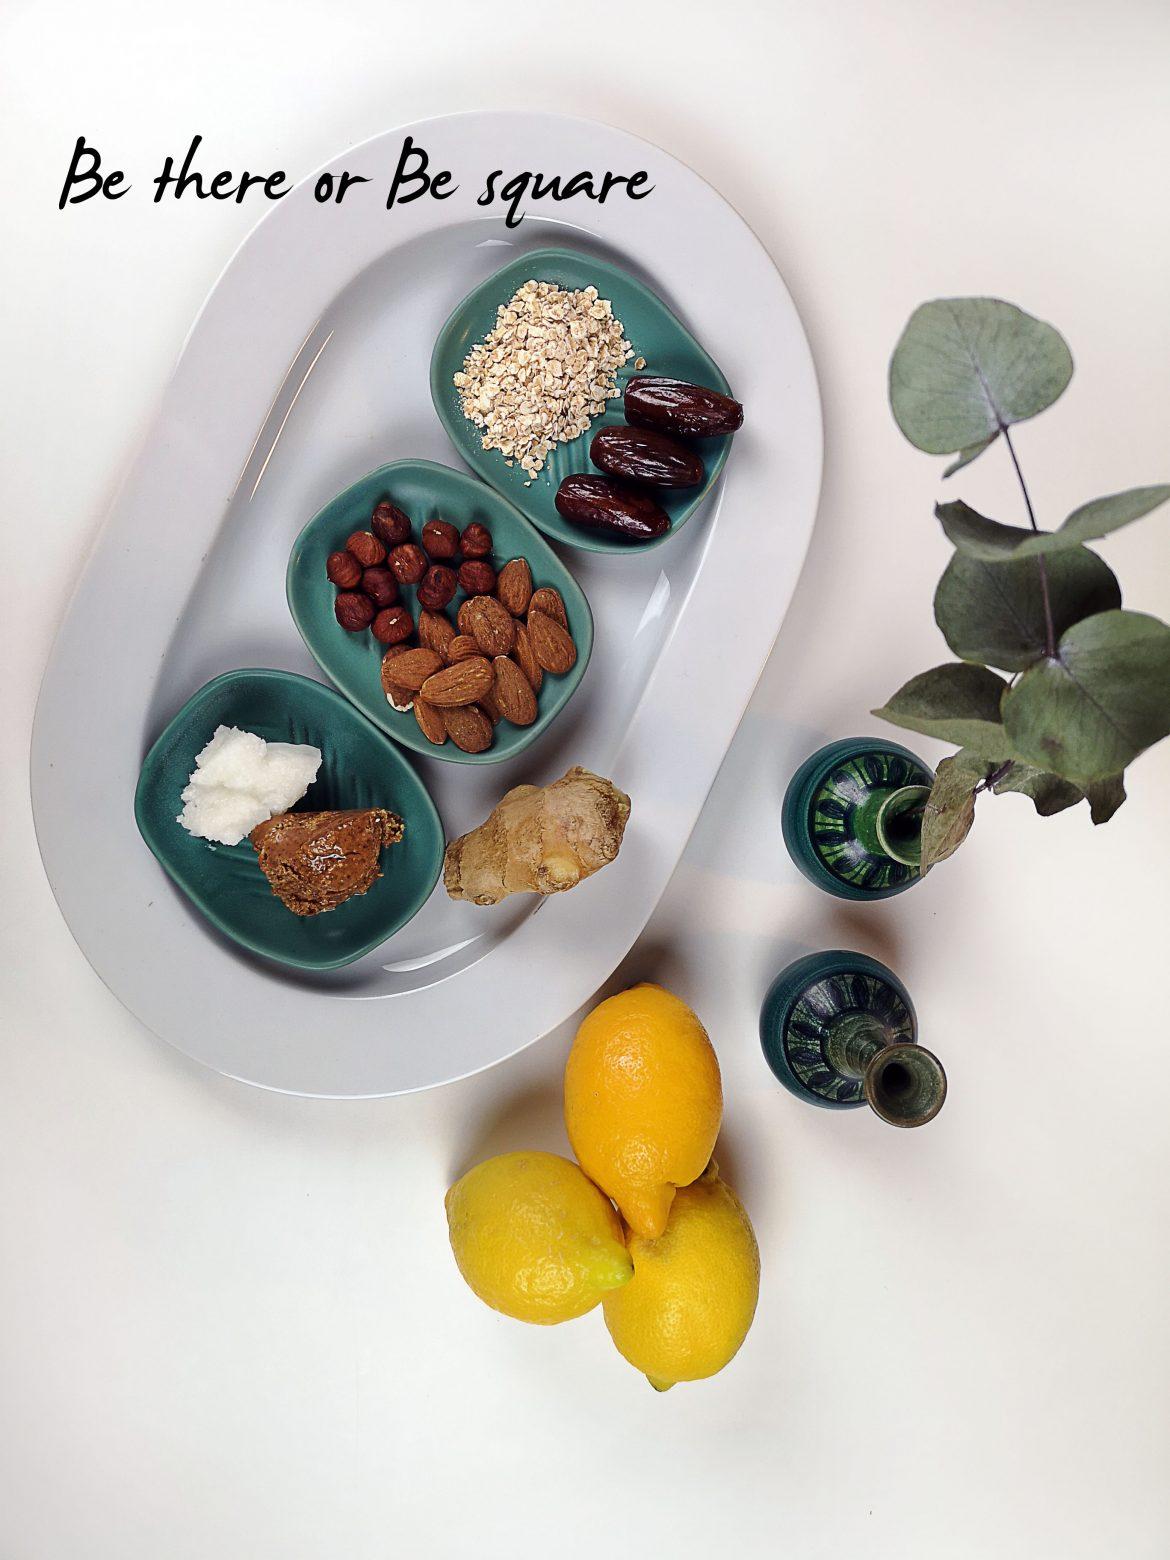 vegan vegeterian nötter dadlar raw food dadel